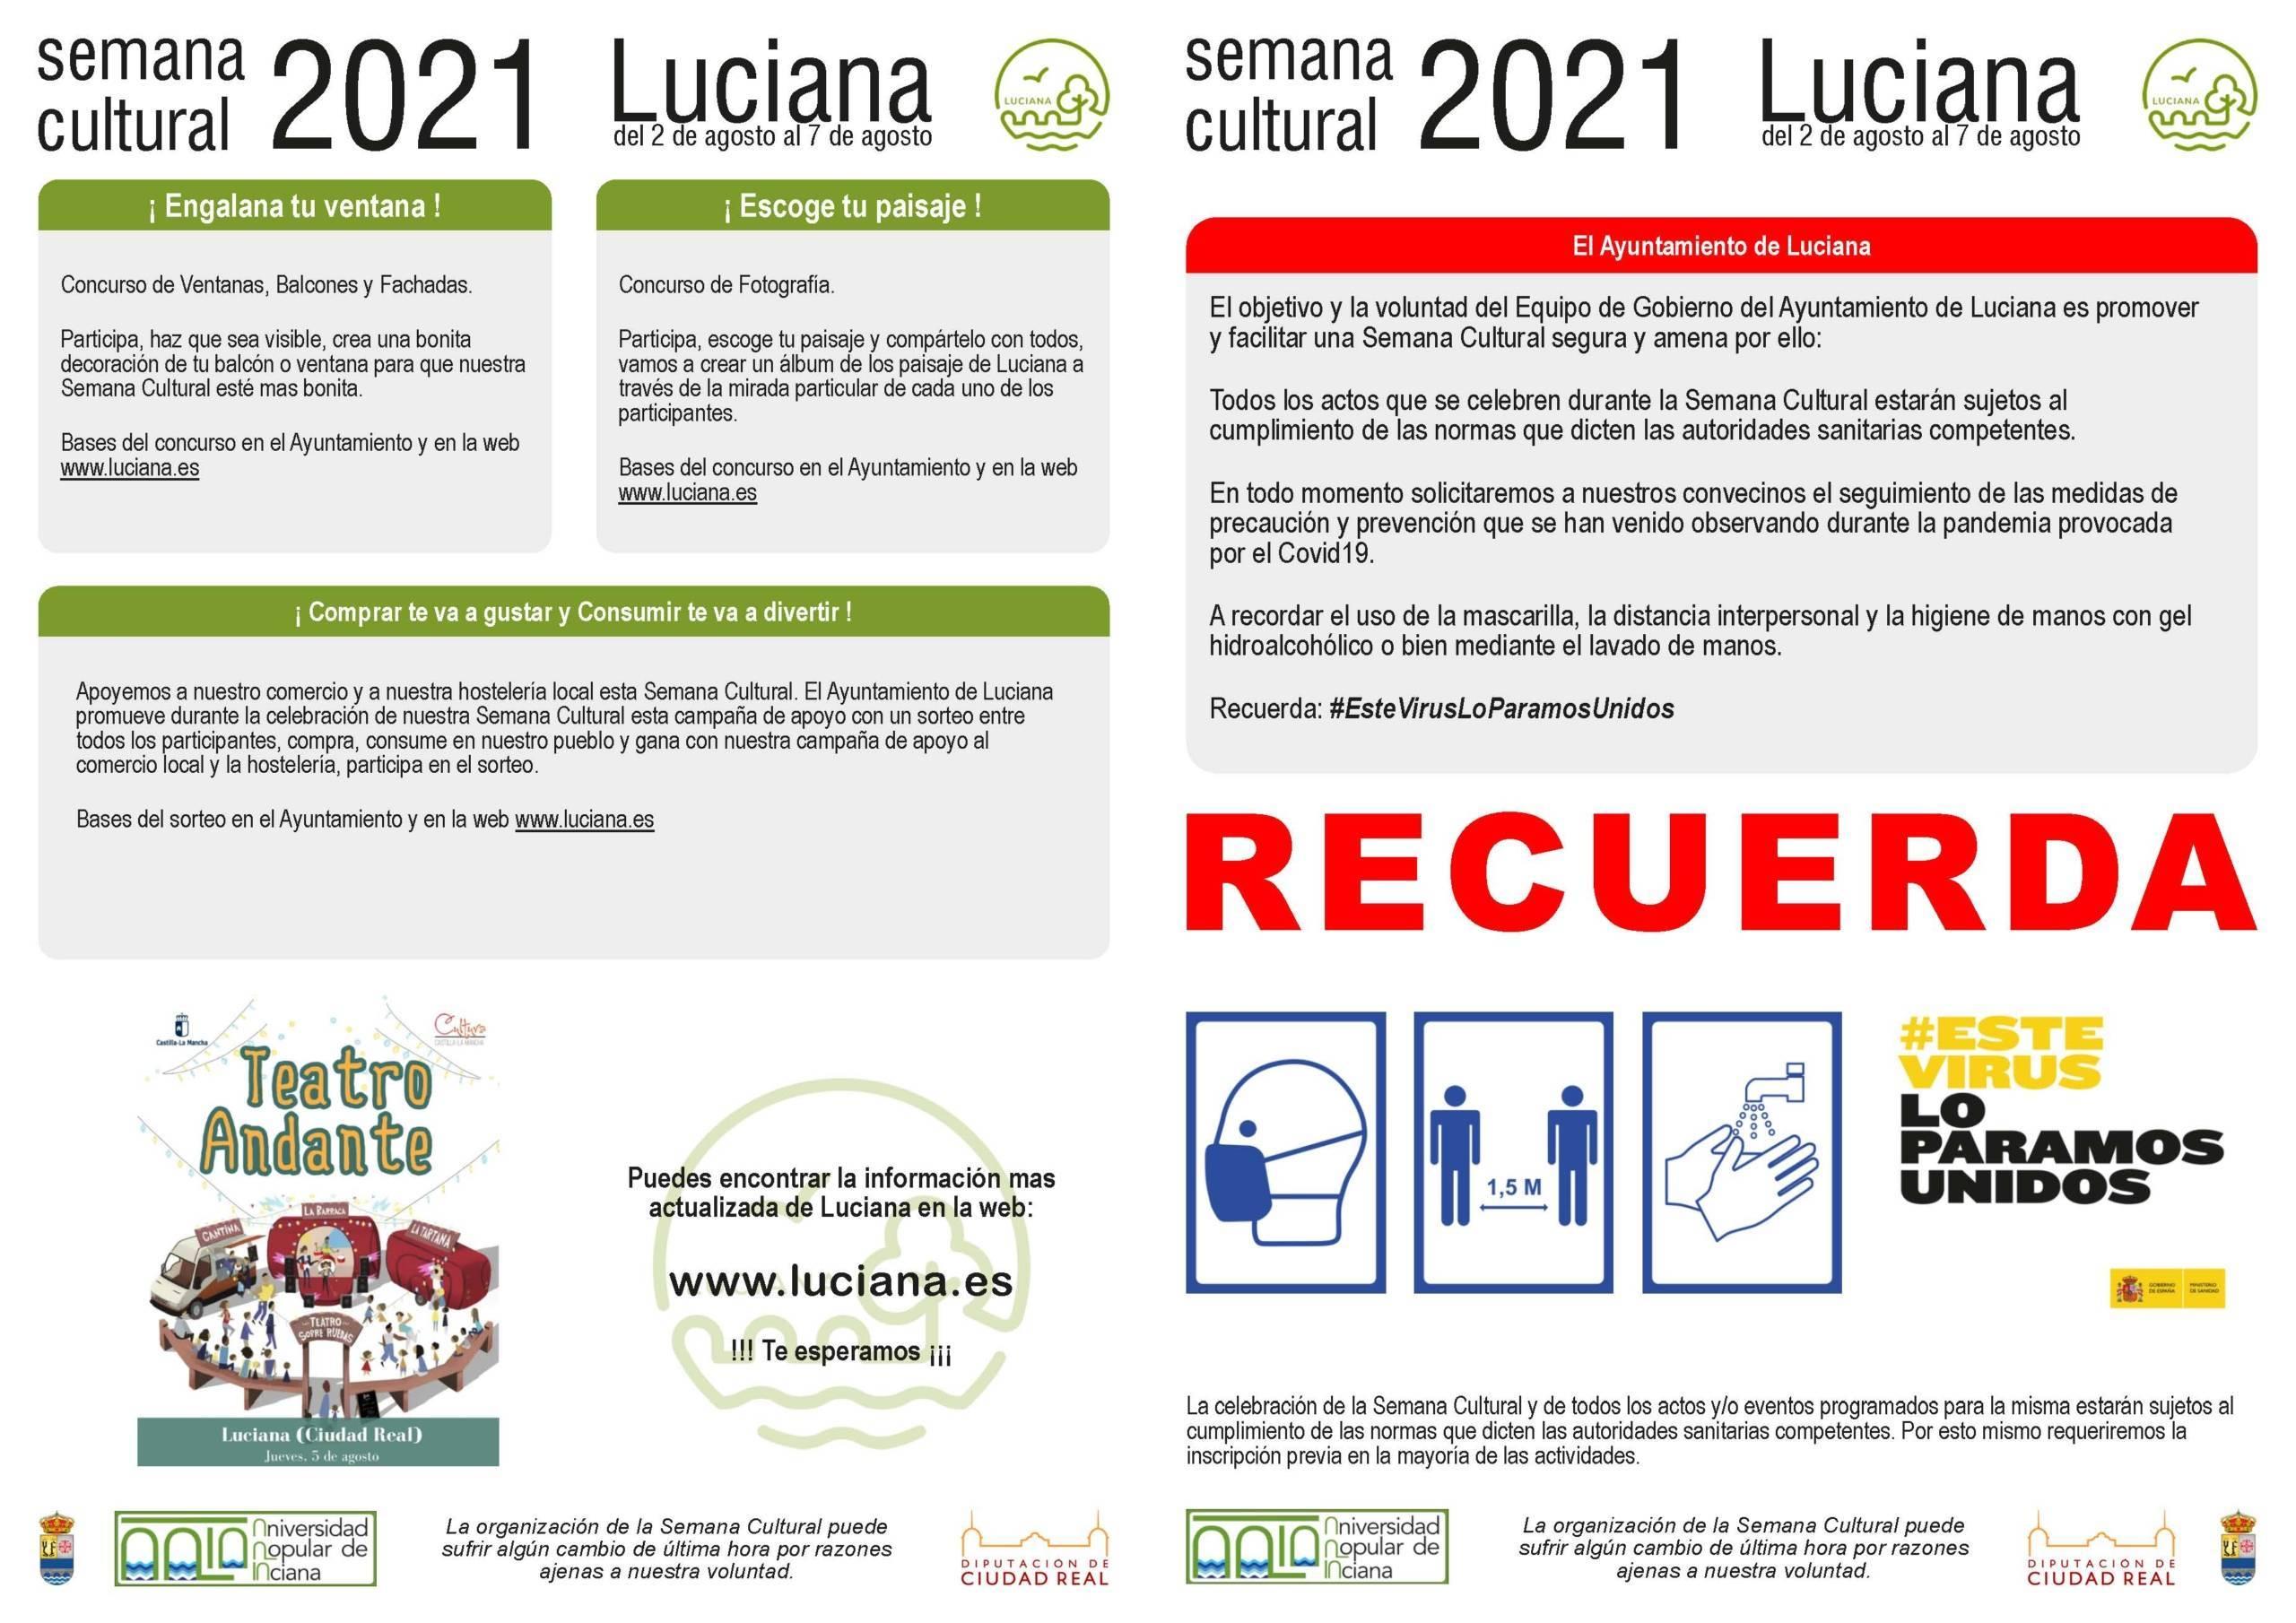 Semana Cultural (2021) - Luciana (Ciudad Real) 1